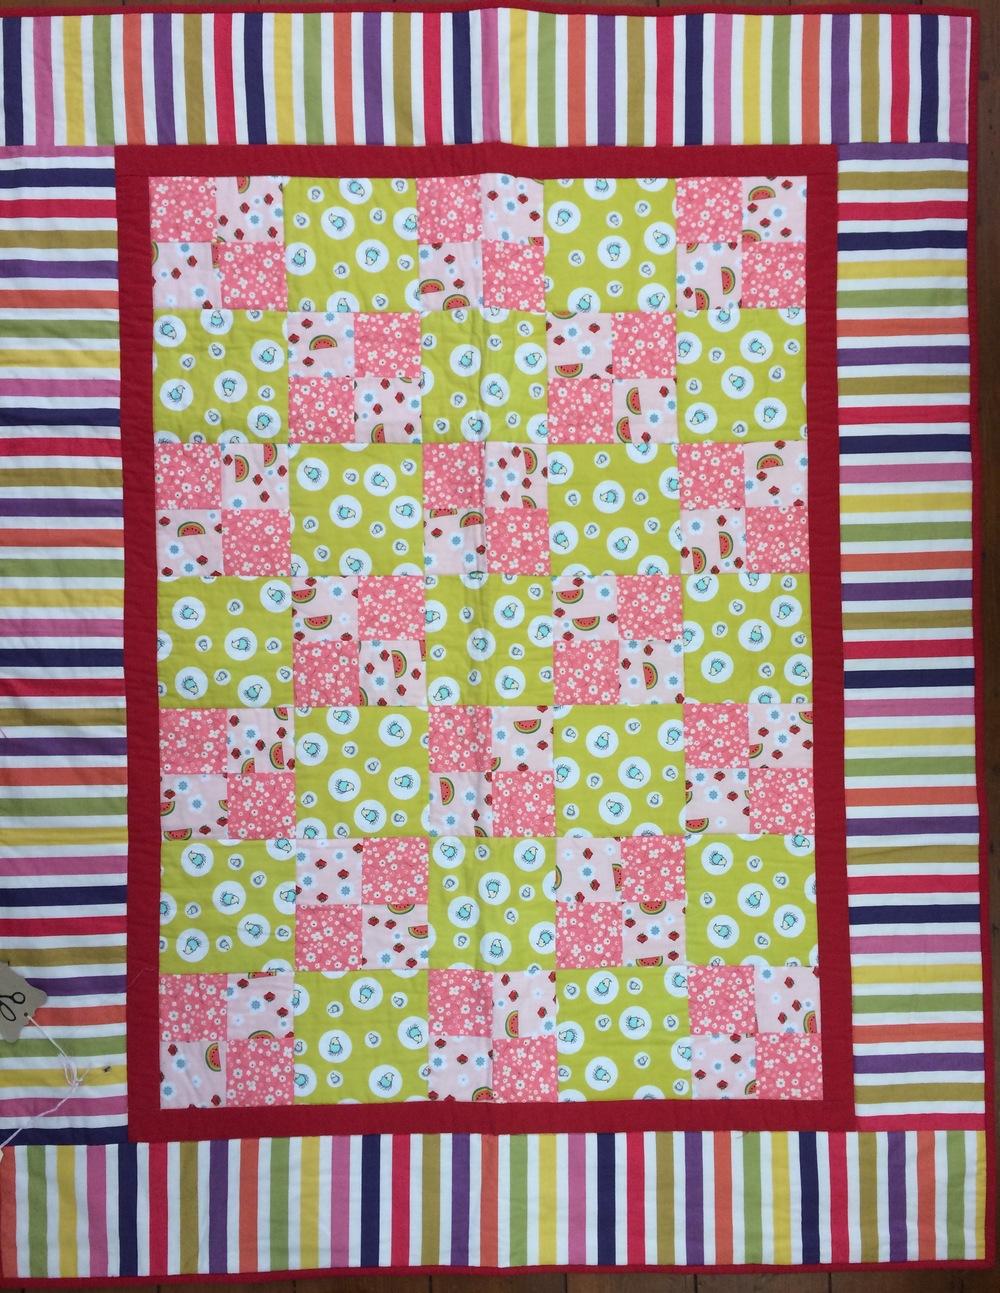 Hettie's Patch pattern, 'Four Patch Quilt'